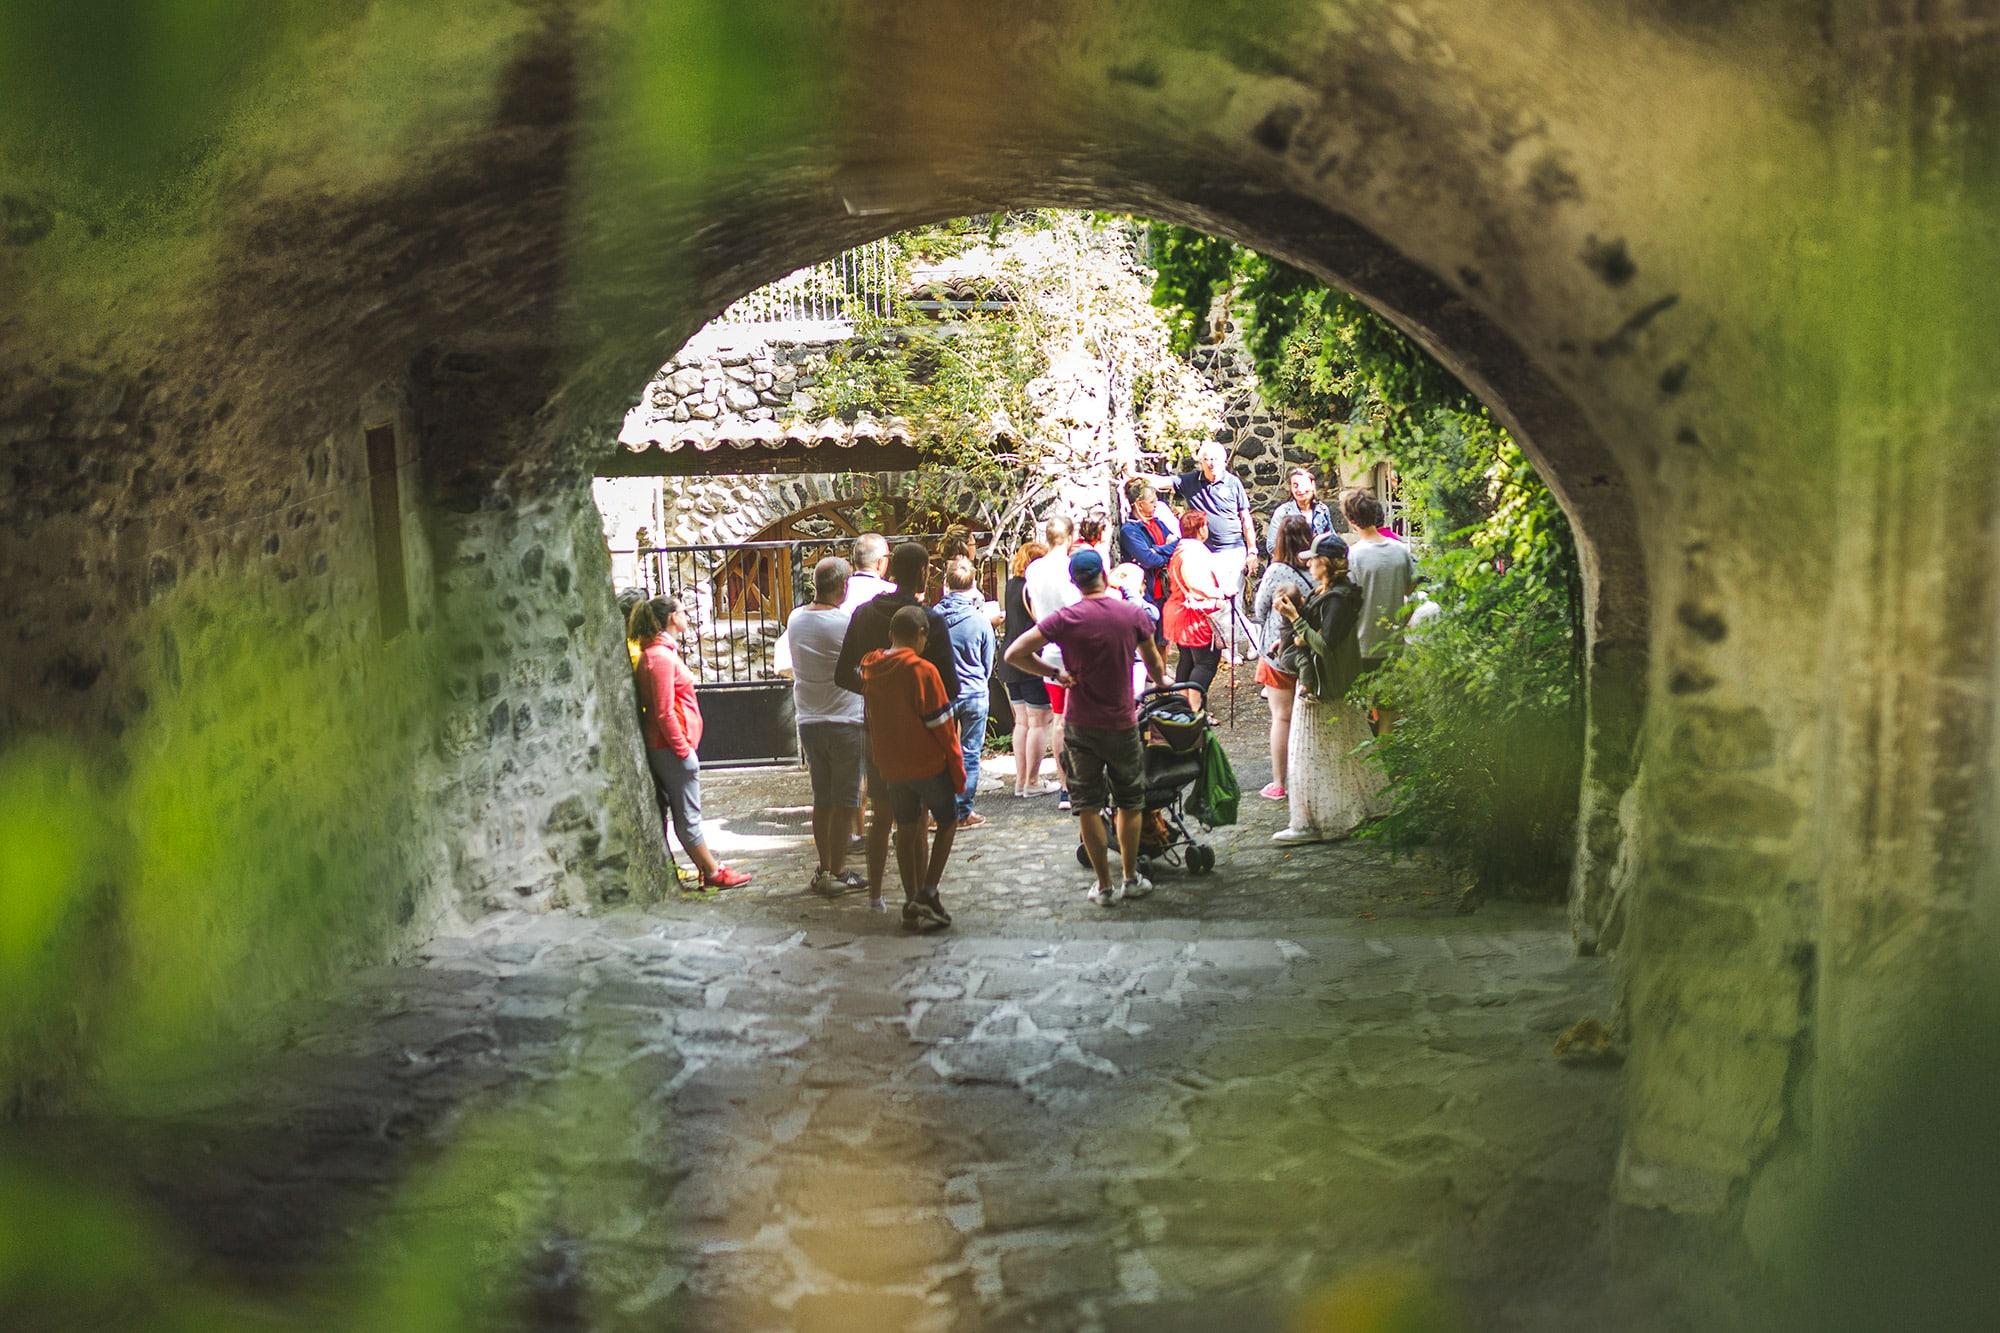 groupe-visite-village-medieval-sud-ardeche